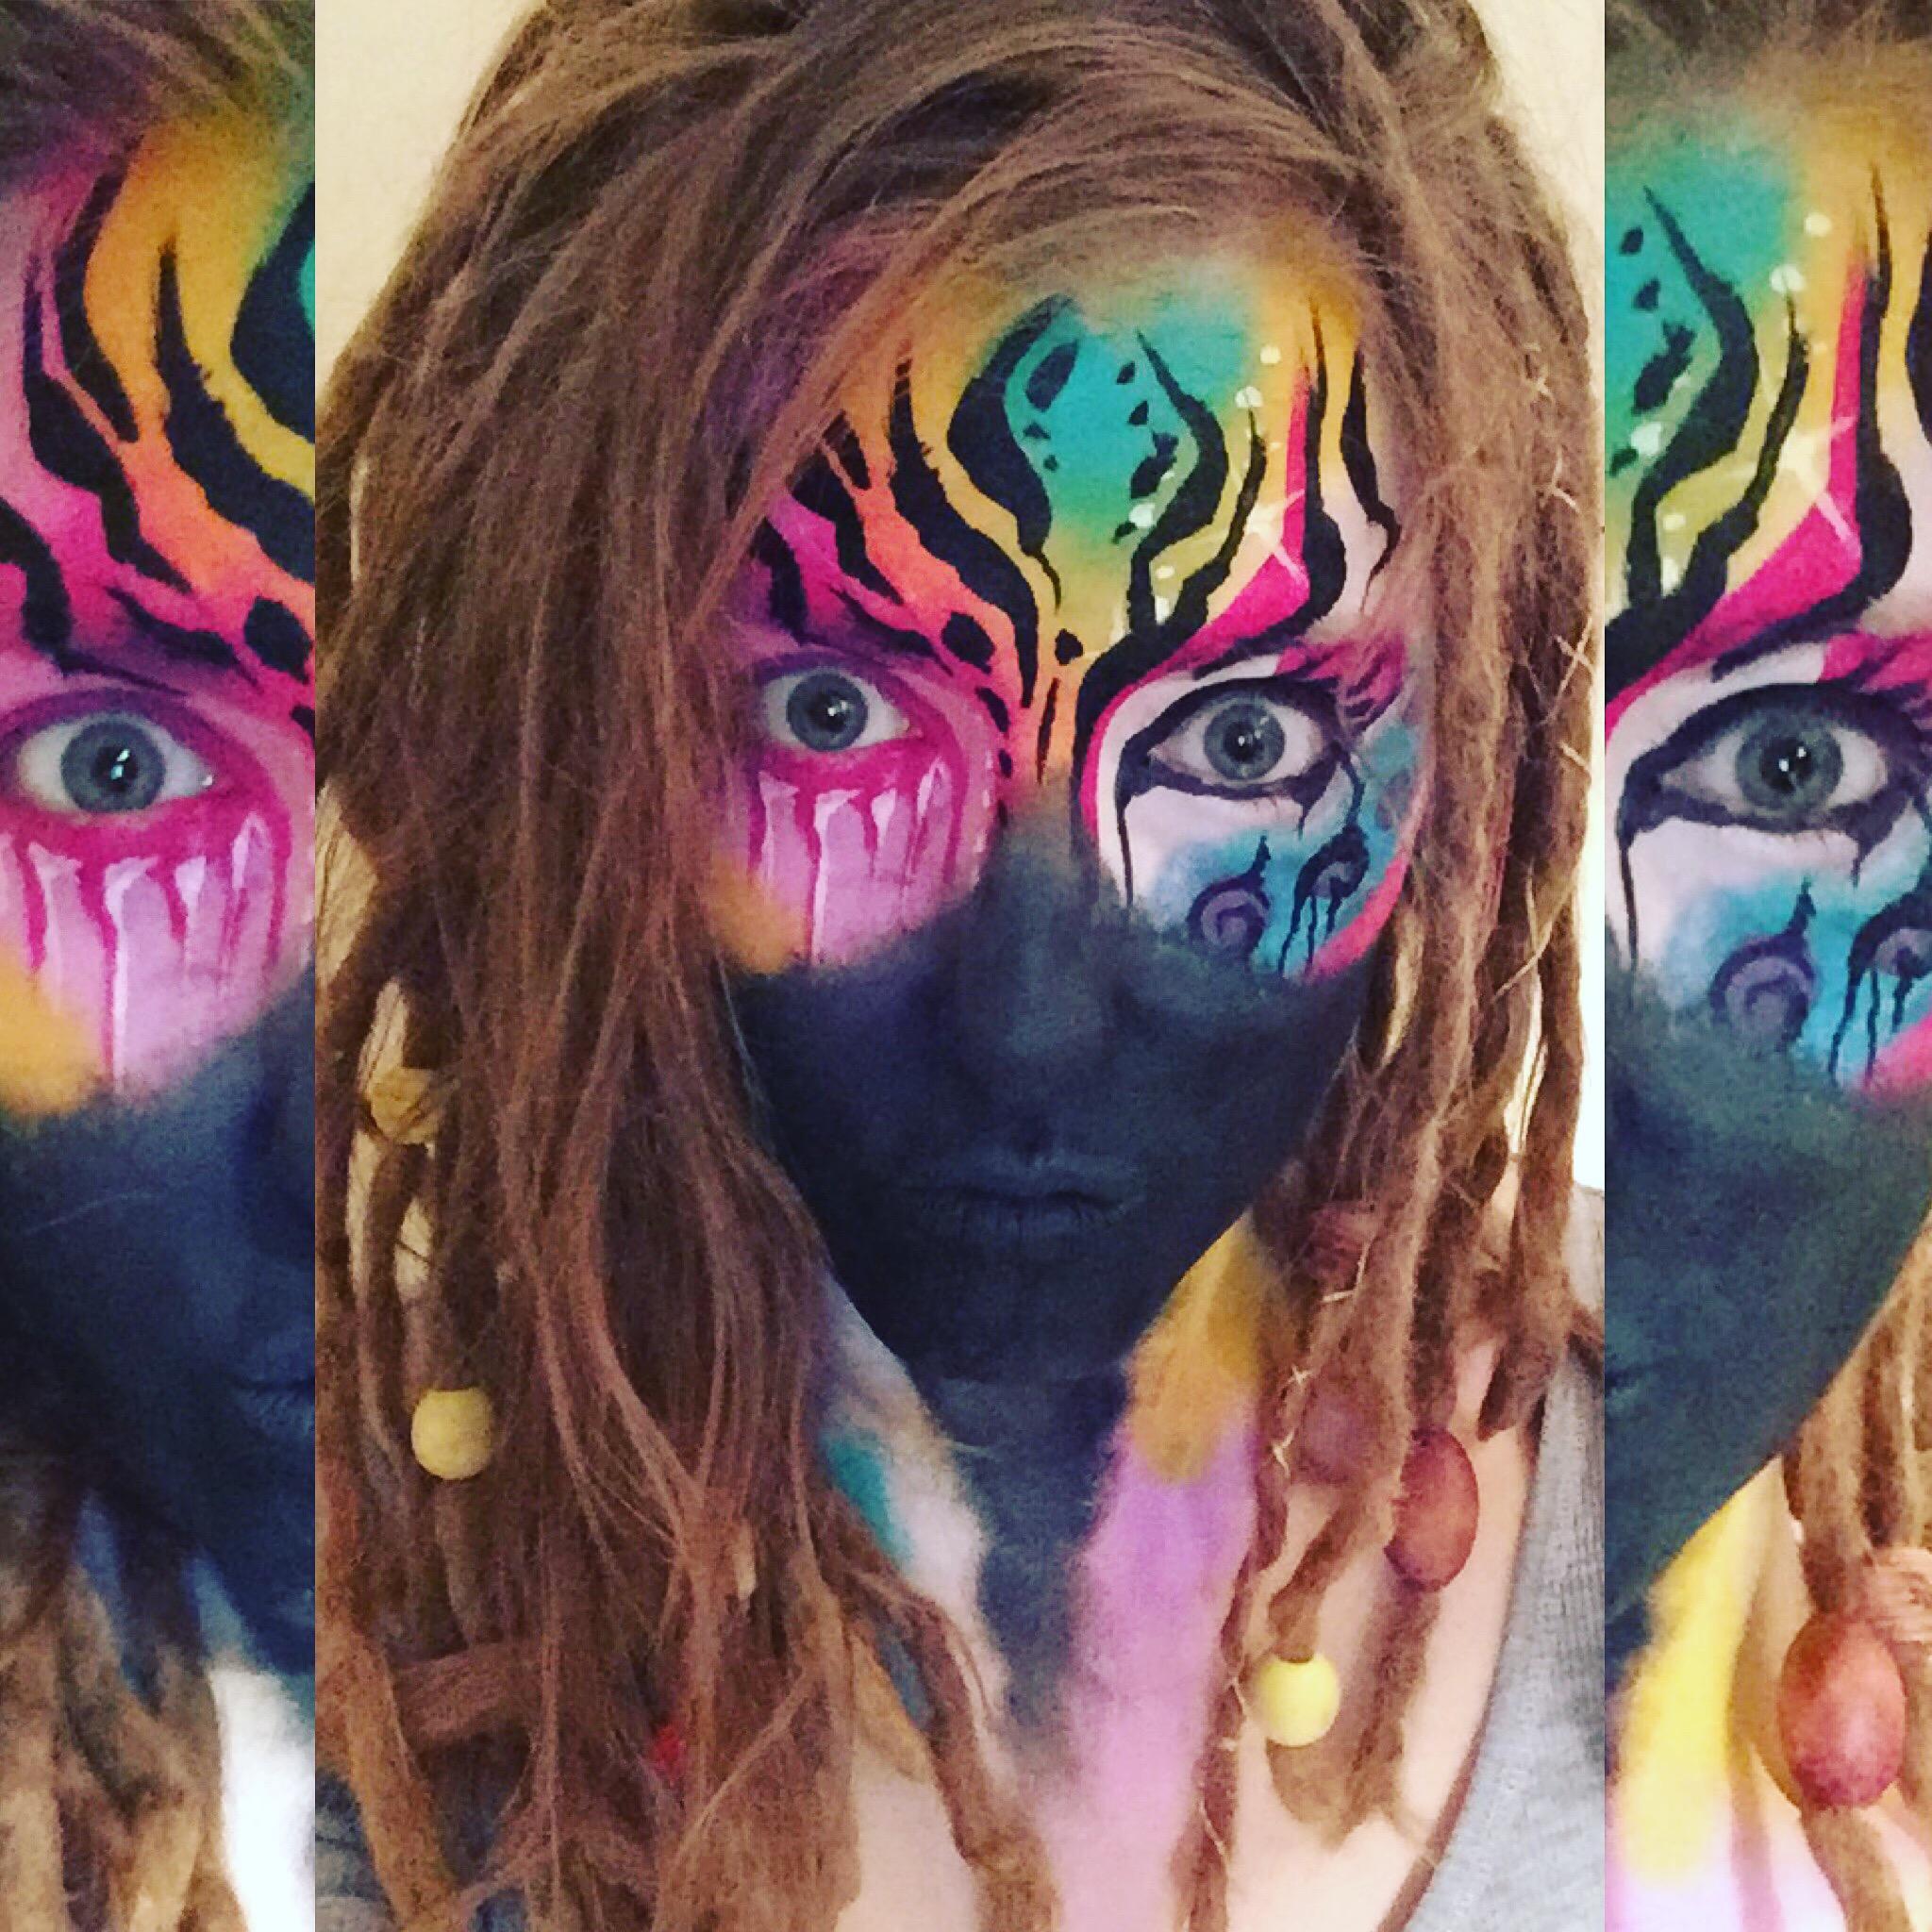 Abstract Face Art Piece